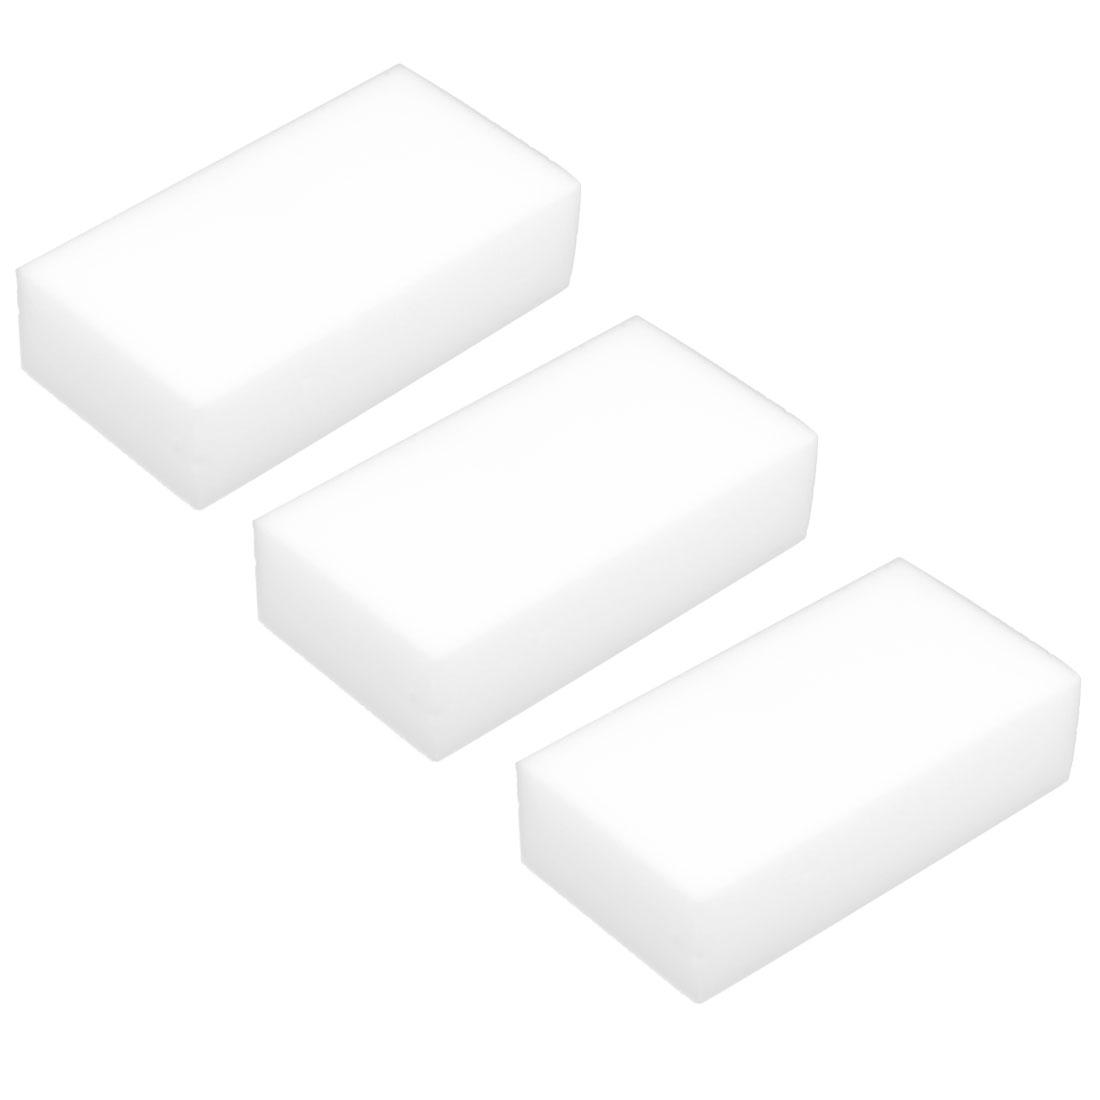 Household Kitchen Pot Pan Dish Table Magic Eraser Cleaning Pad White 3 Pcs